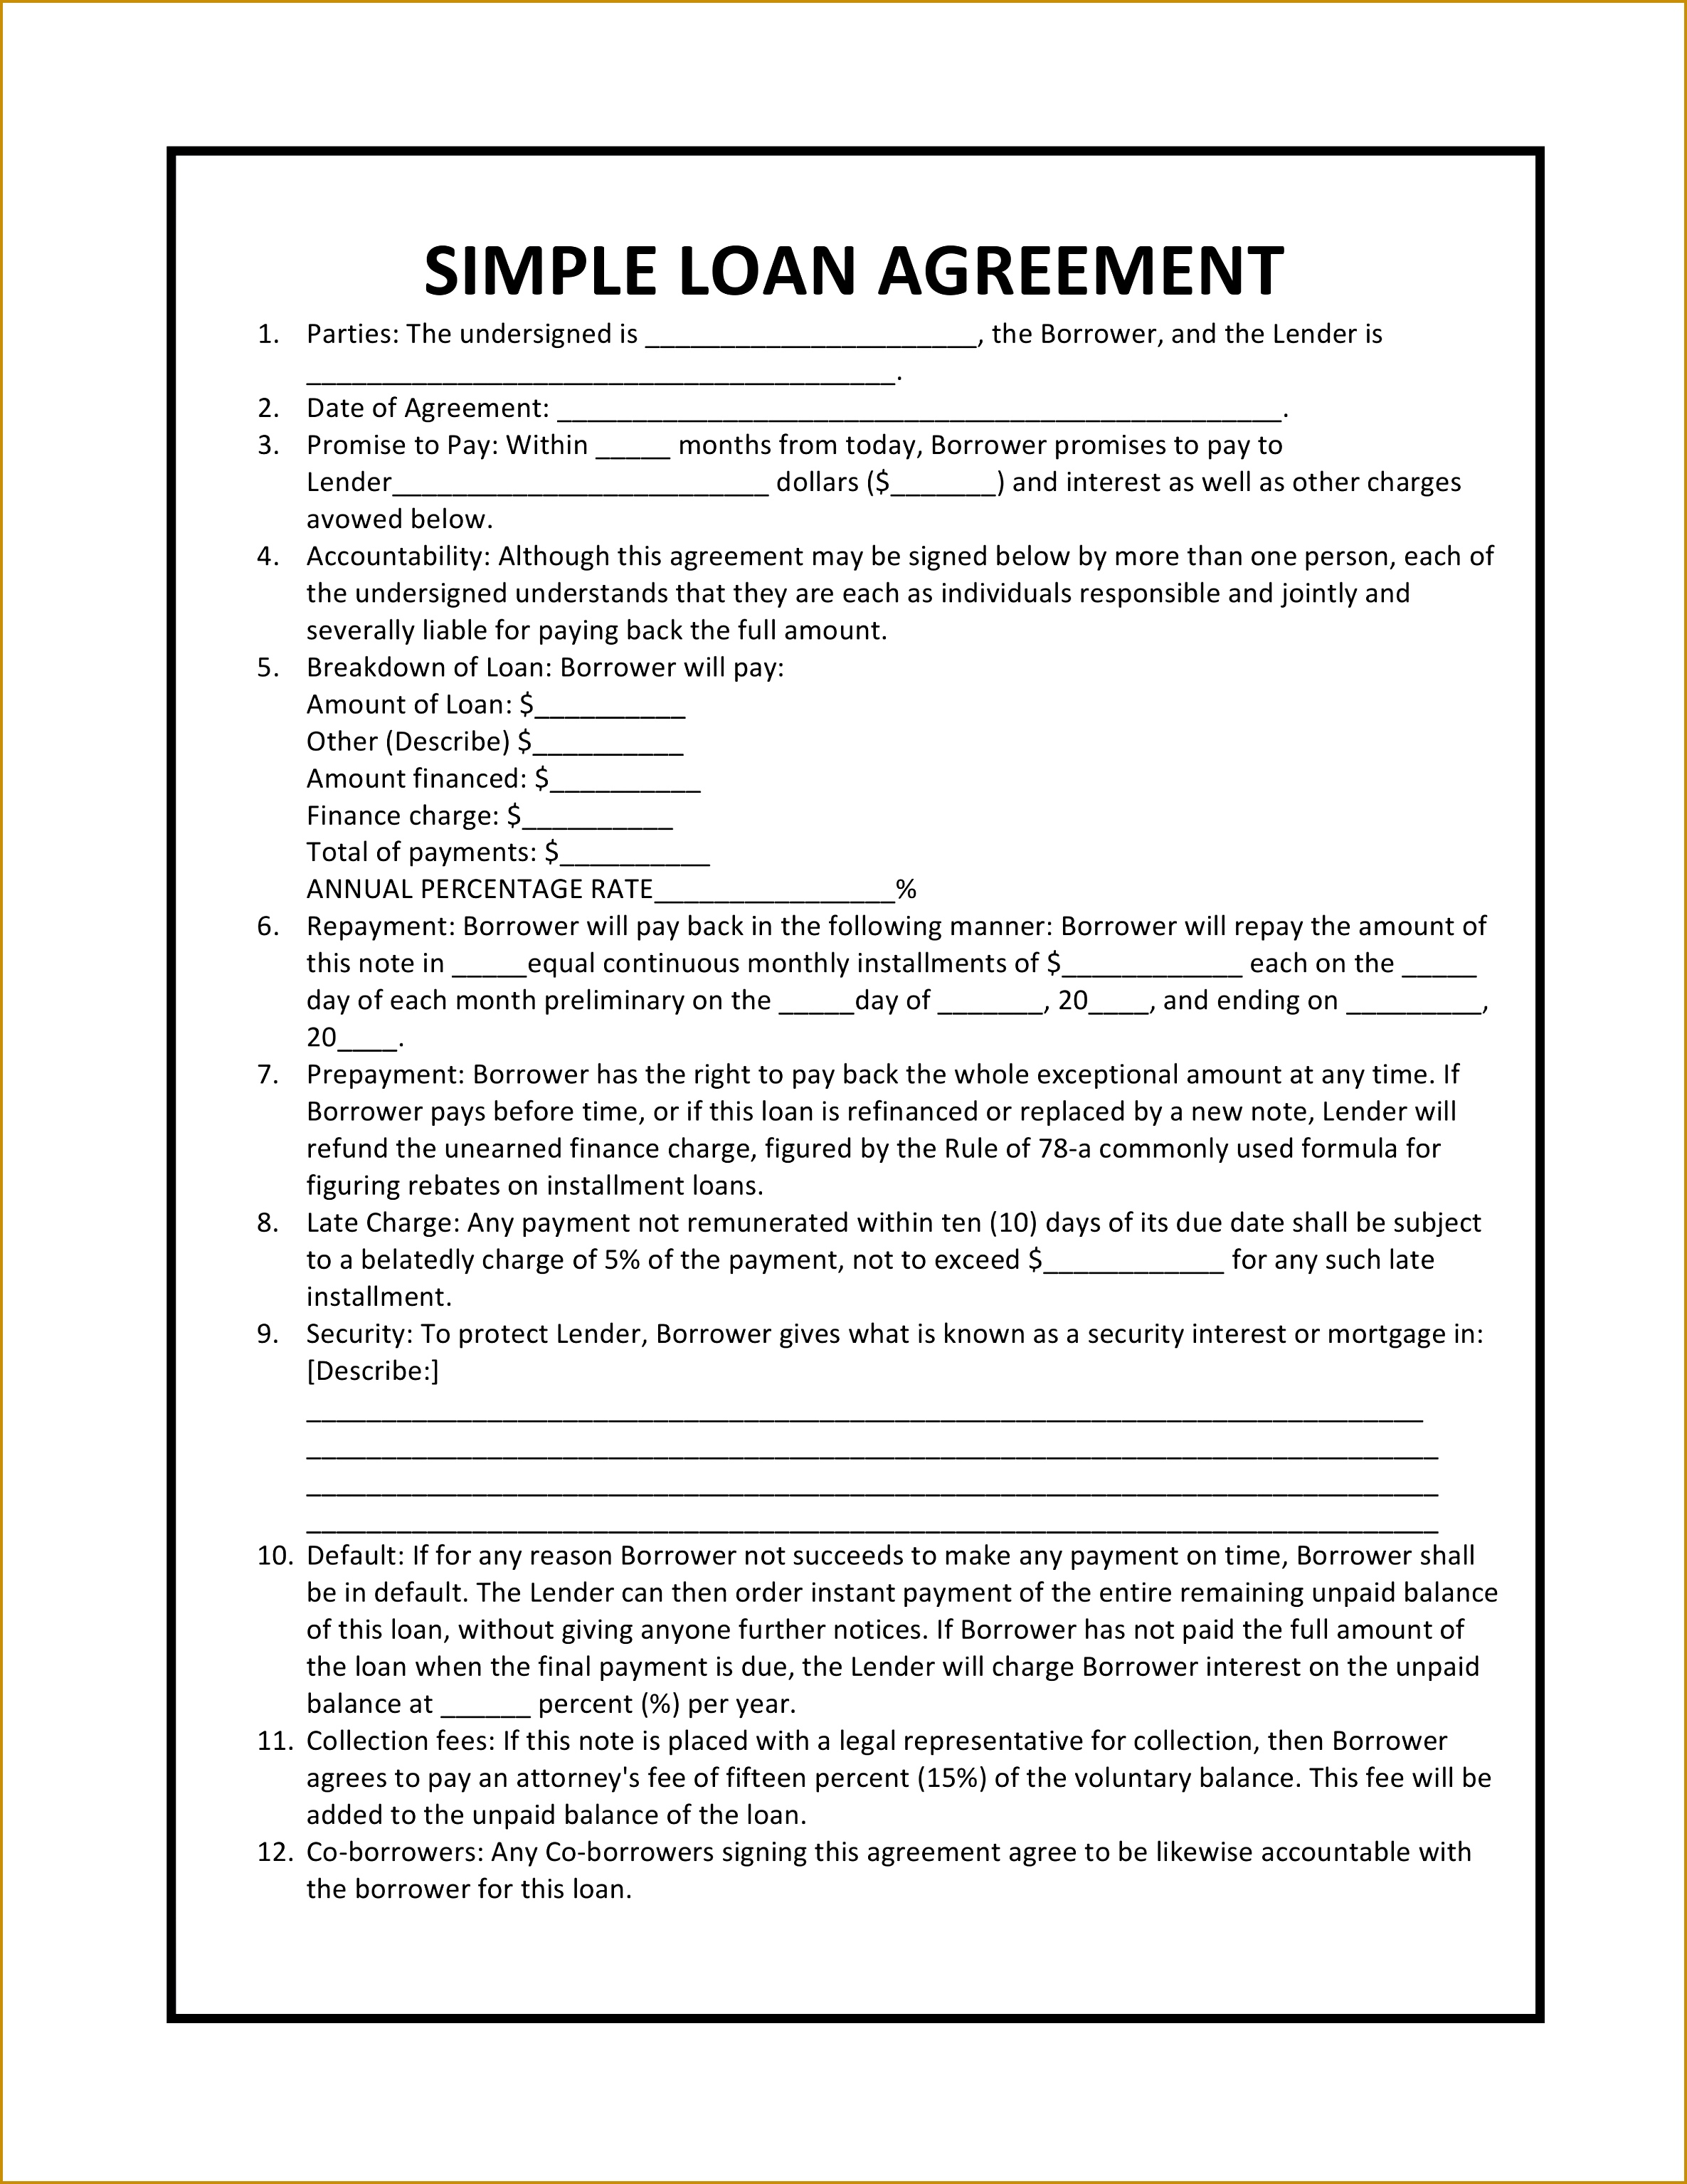 5 artist management agreement doc